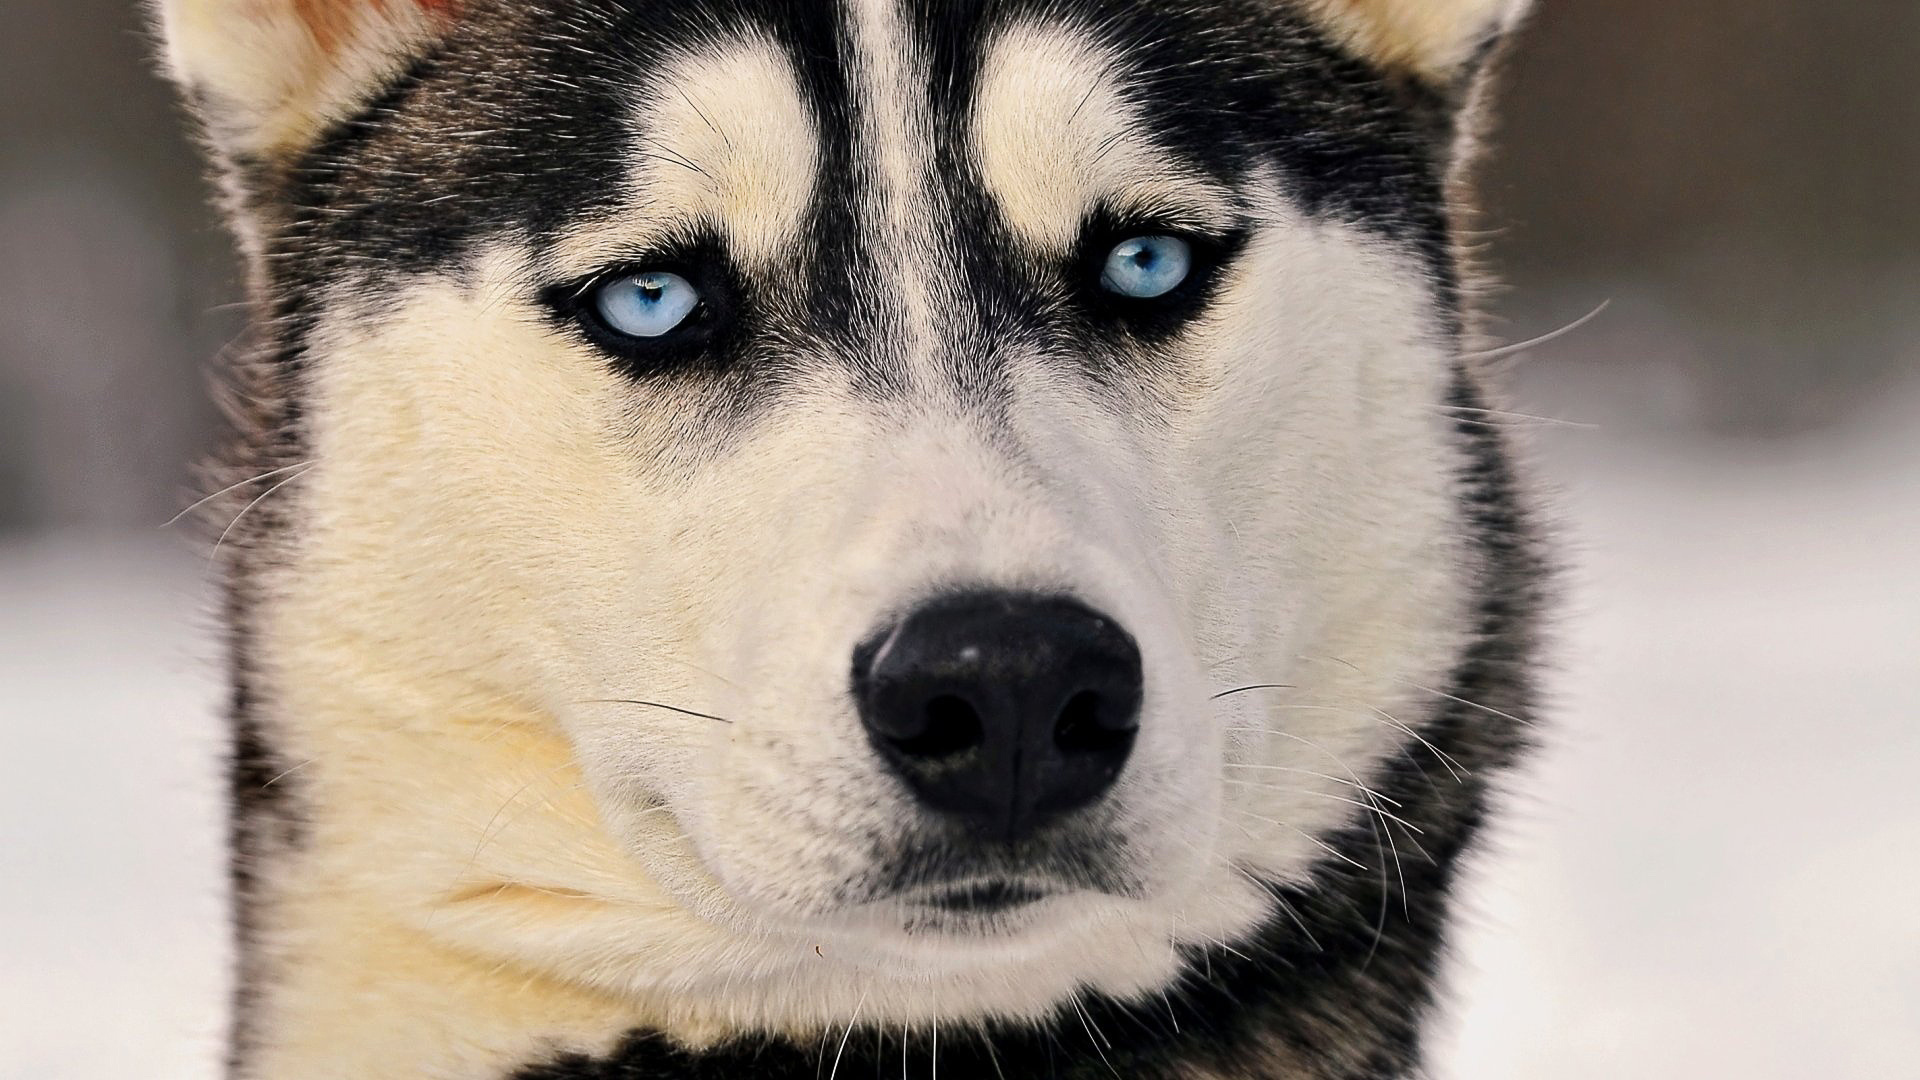 Cool Husky Wallpapers - WallpaperSafari